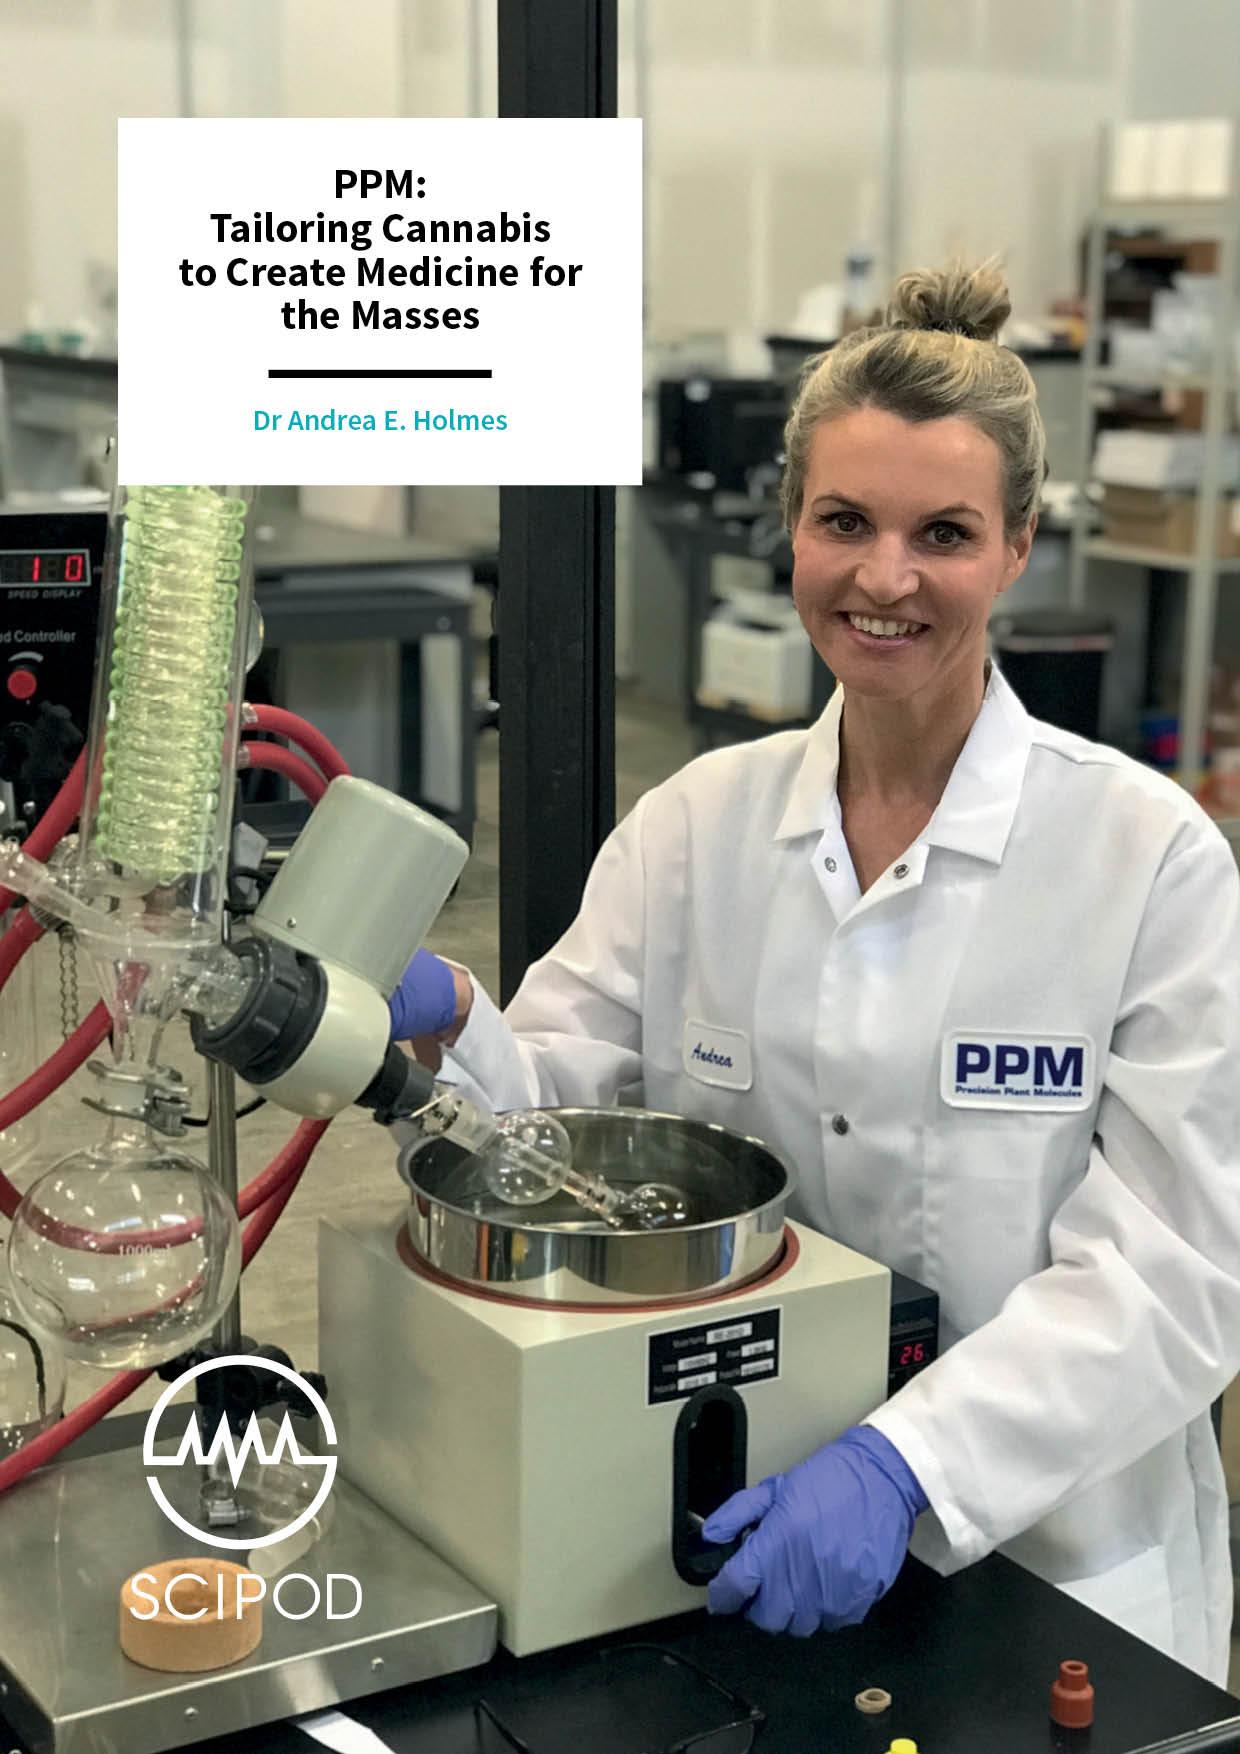 Tailoring Cannabis to Create Medicine for the Masses – Dr Andrea E. Holmes, Precision Plant Molecules